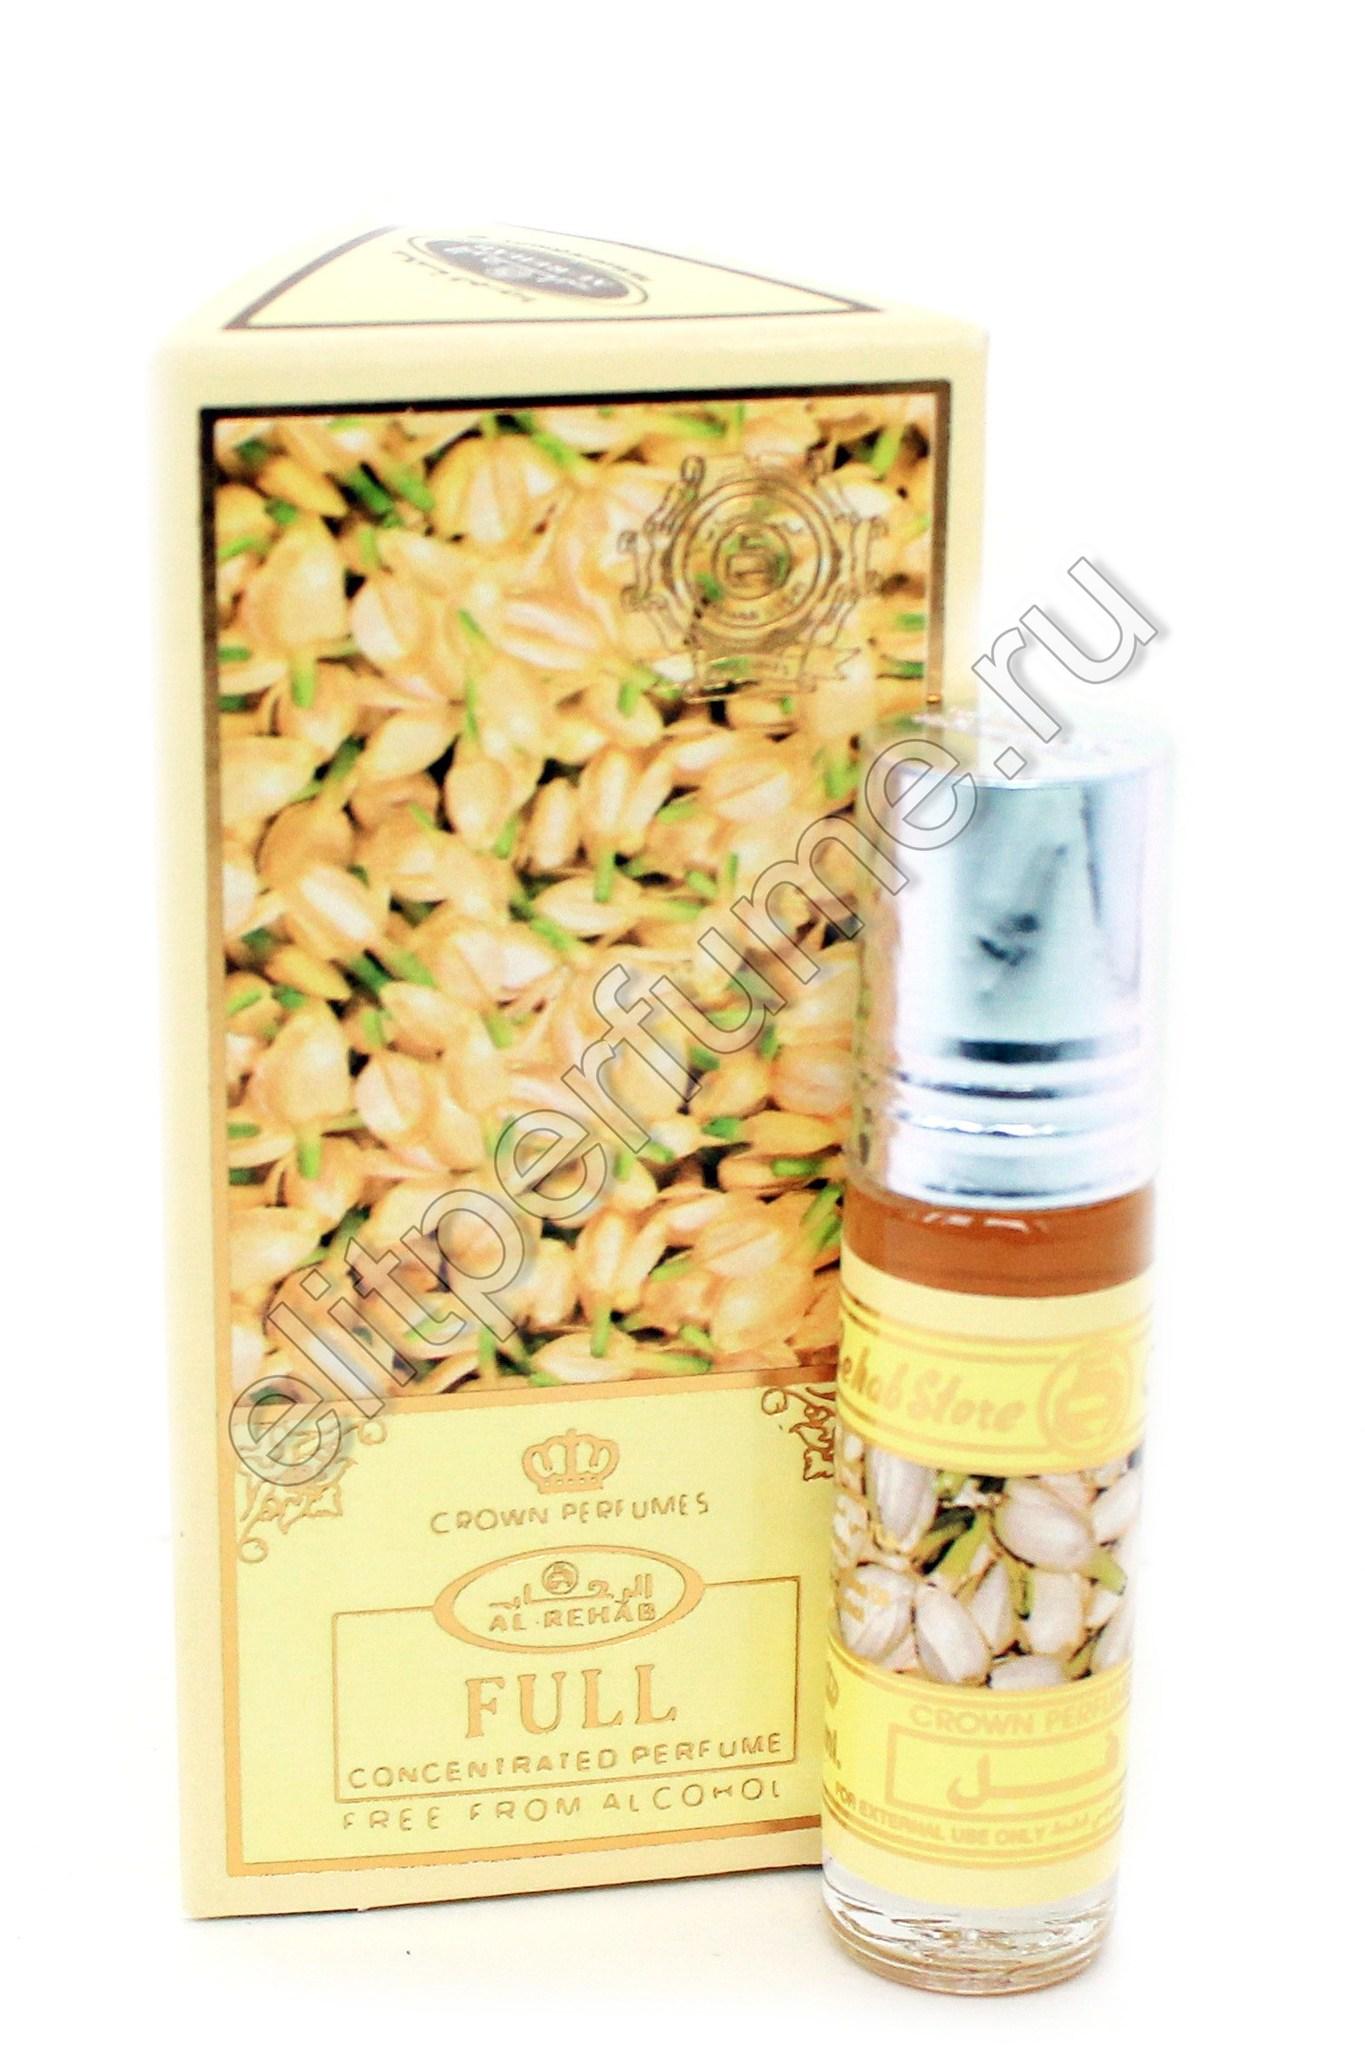 Full Фул 6 мл арабские масляные духи от Аль Рехаб Al Rehab